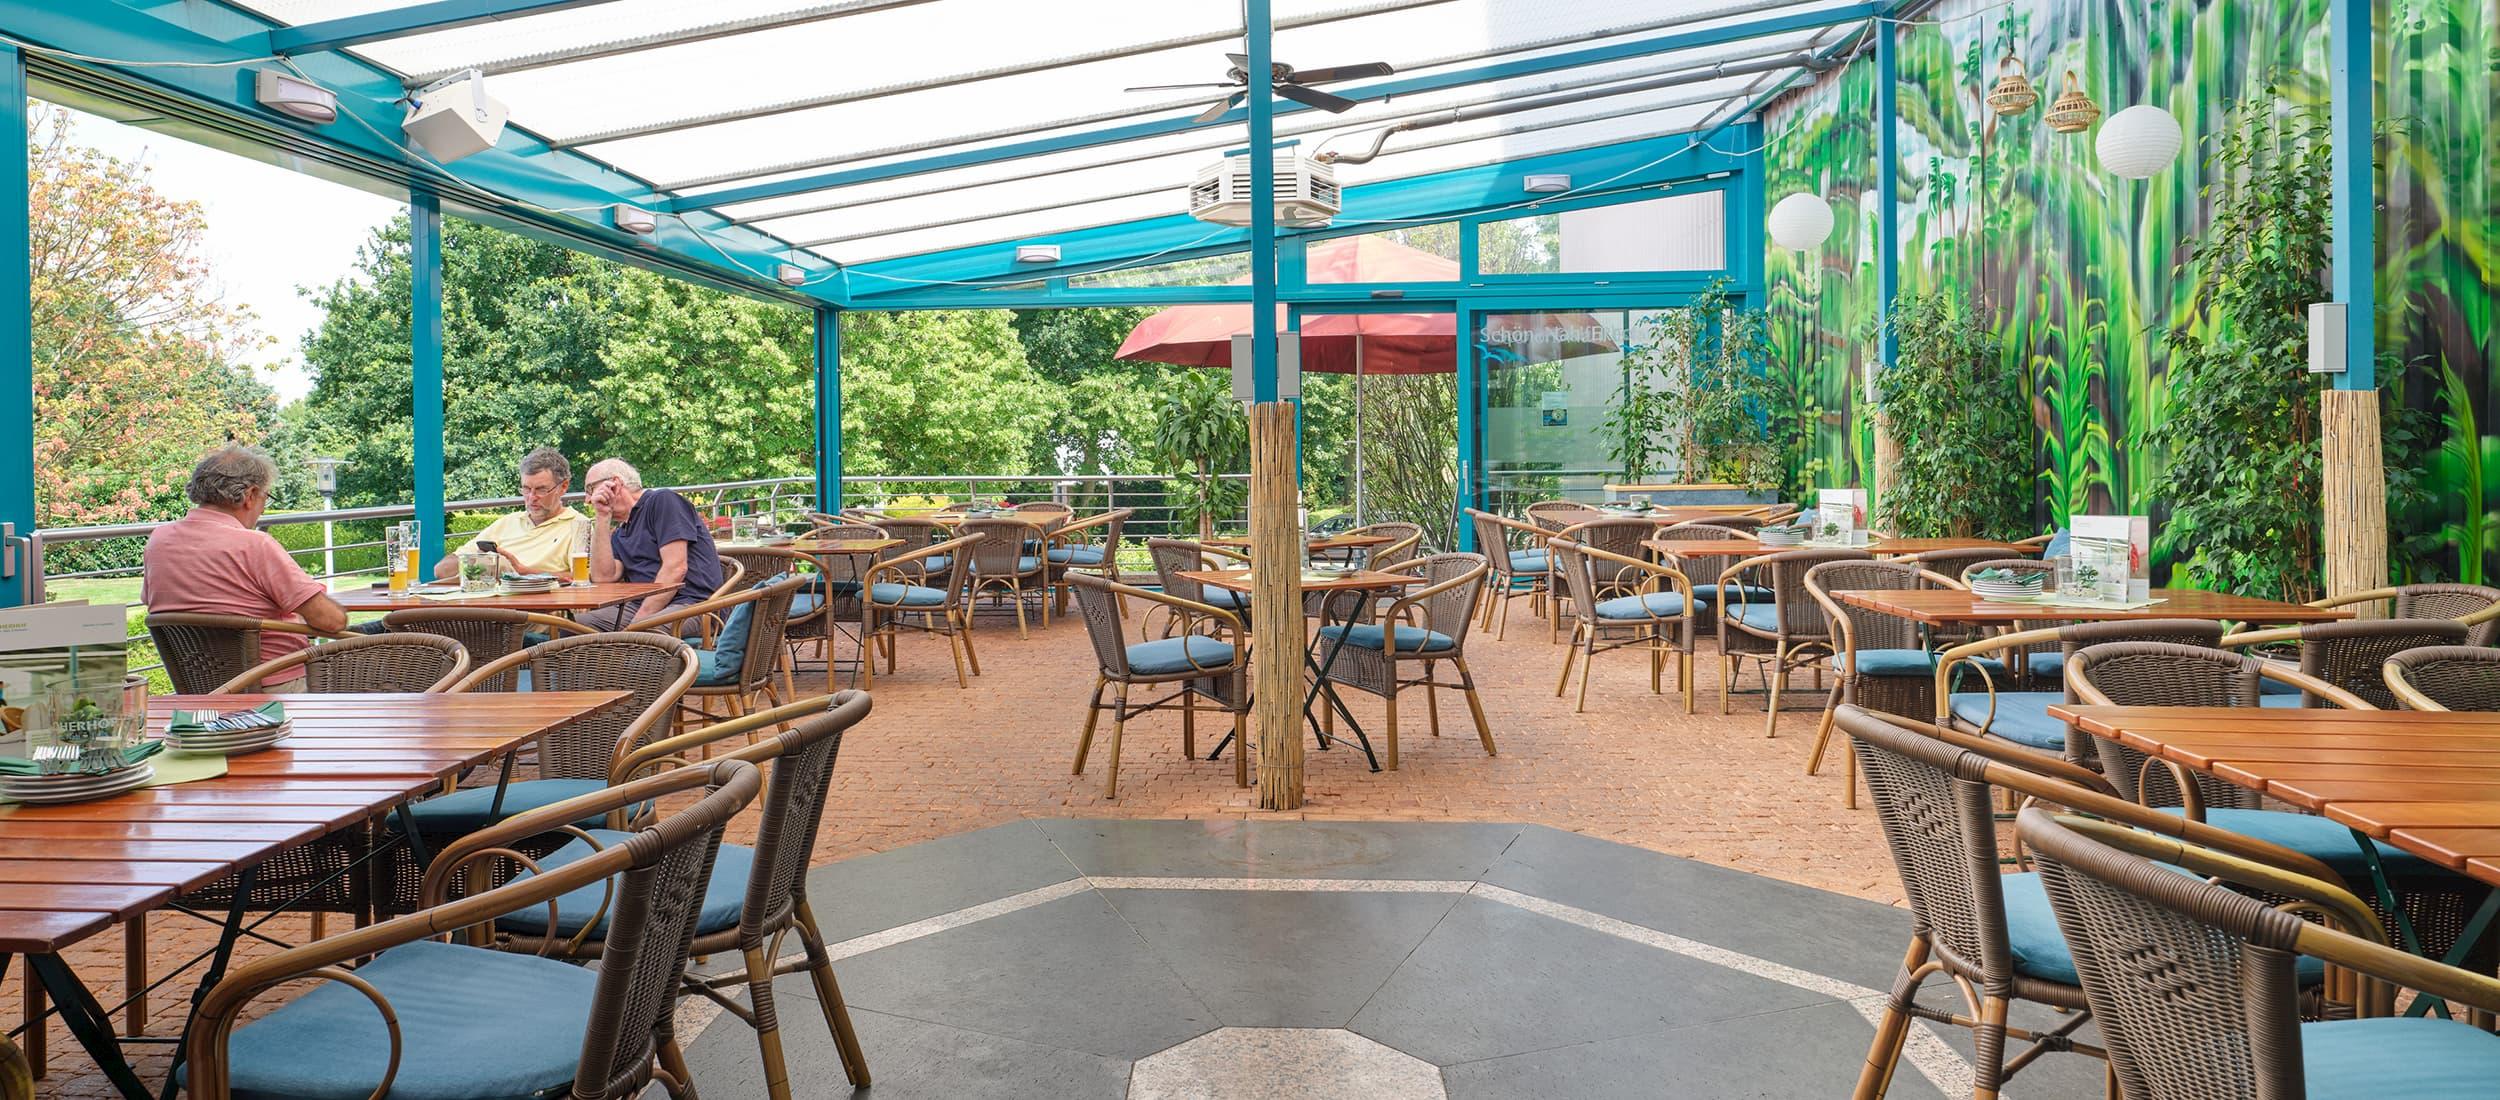 01_Kopfbild-restaurant